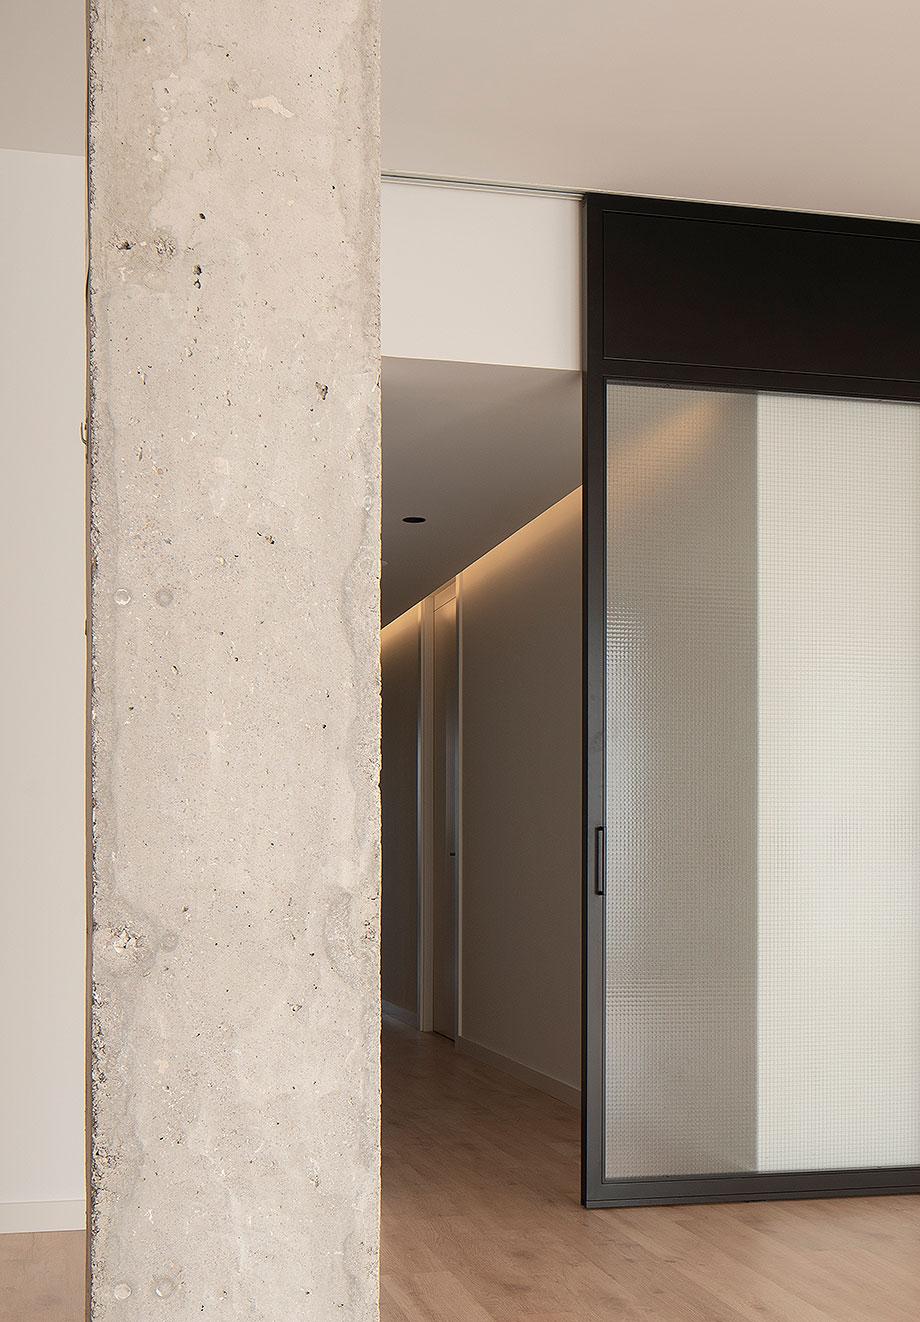 clinica heben de jr arquitectura (8) - foto david zarzoso